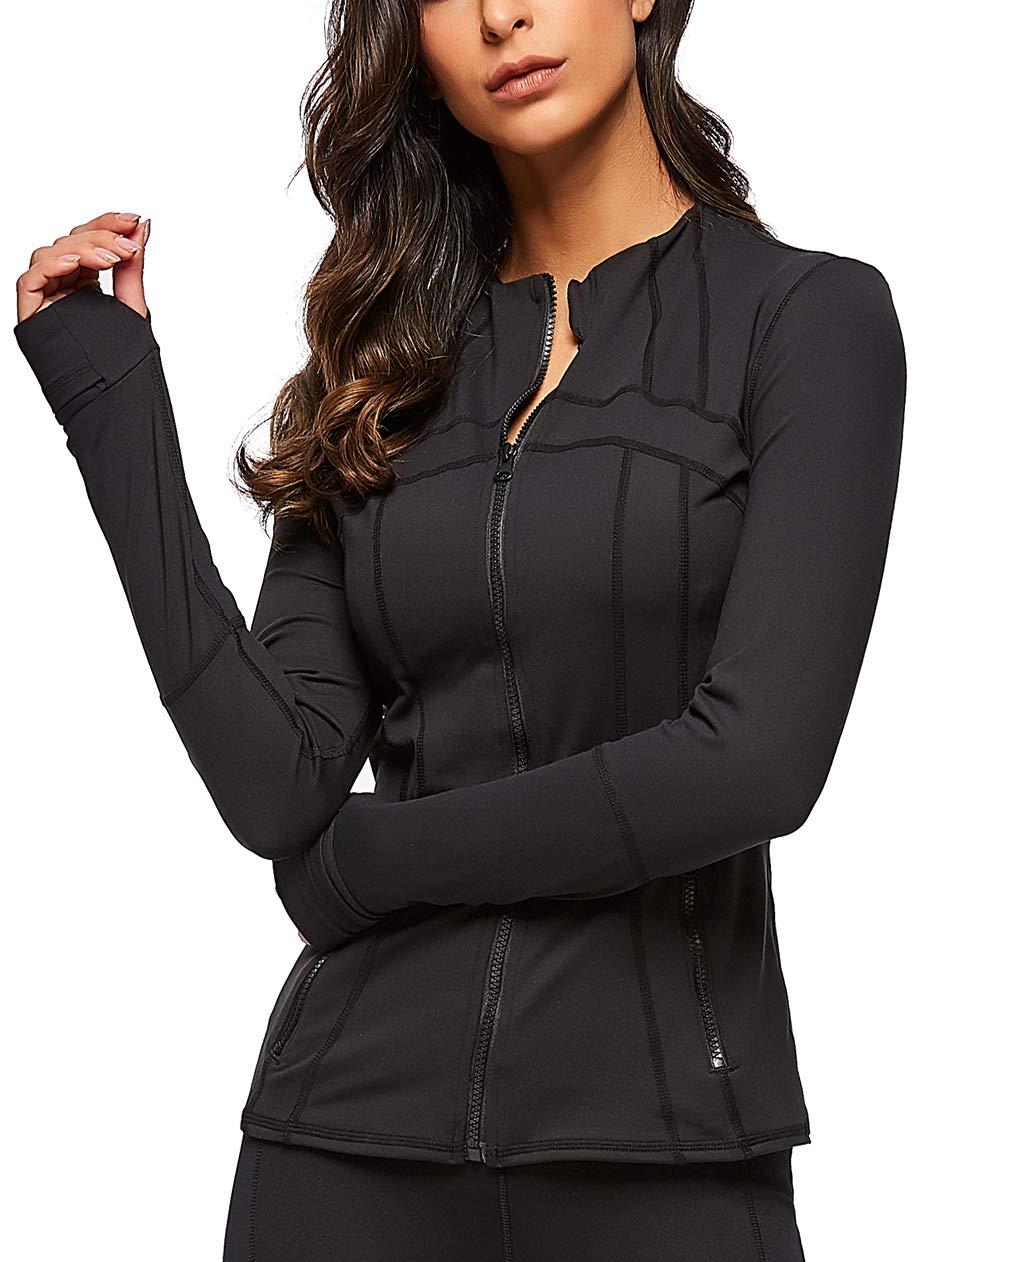 UDIY Women Long Sleeve Jacket, Running Yoga Workout Slim Sweatshirts with Two Side Pocket by UDIY